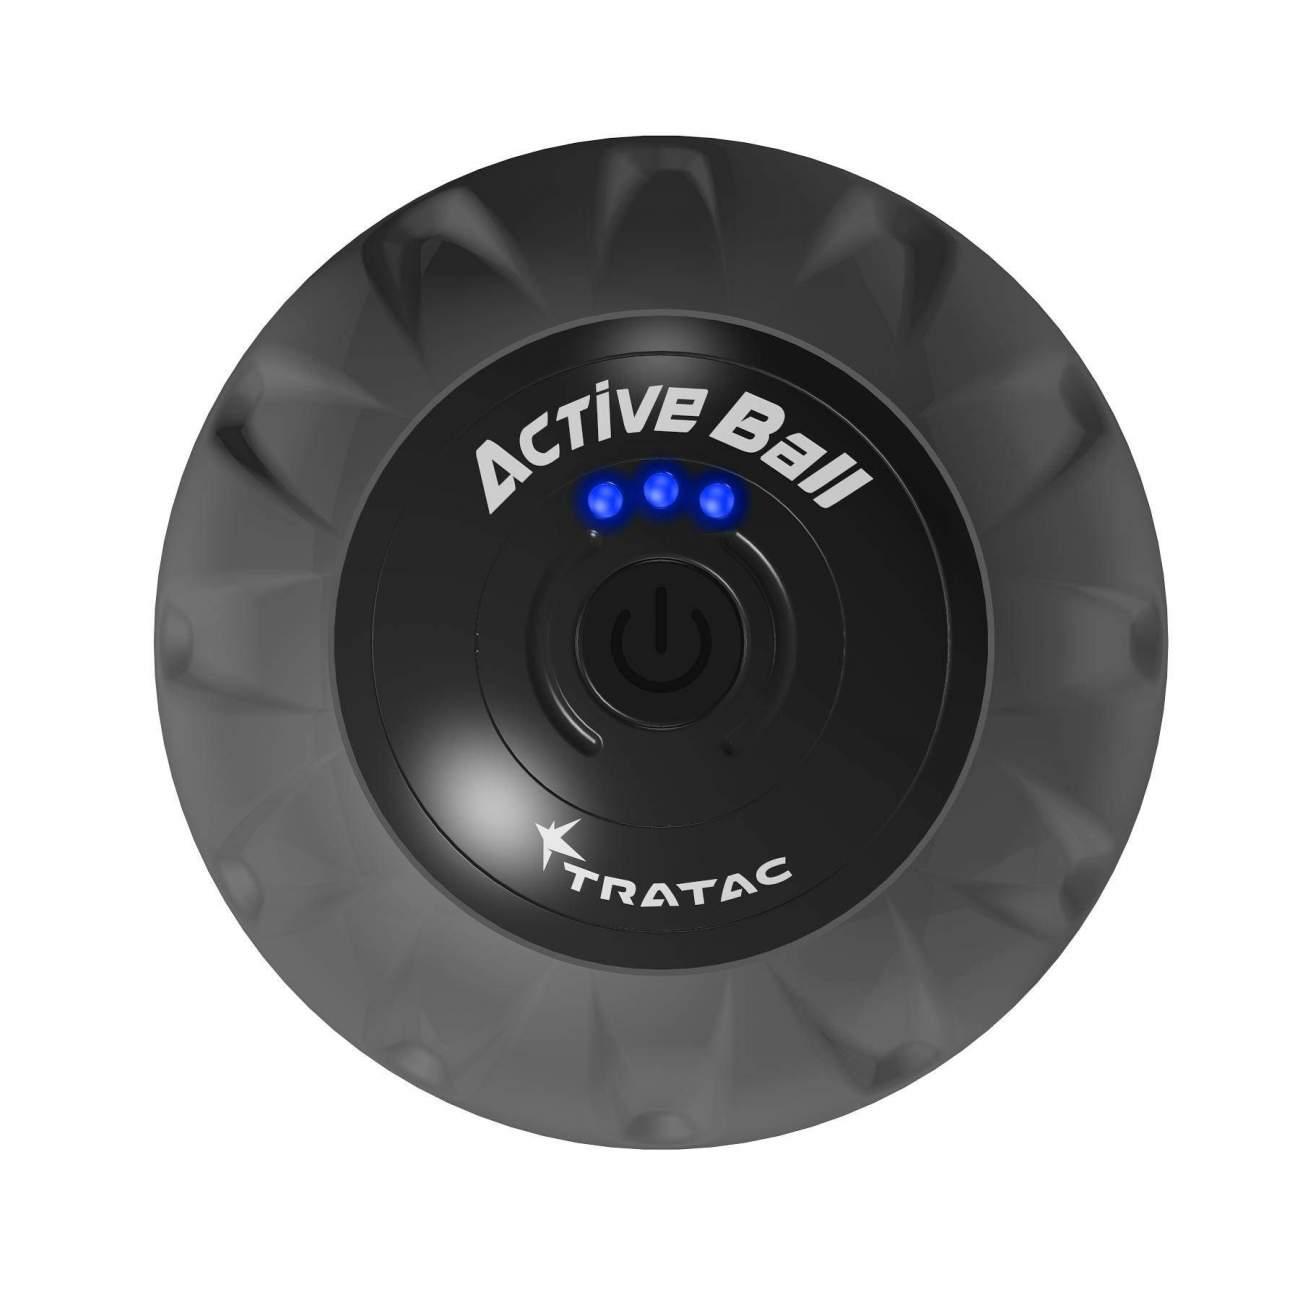 Tratac Active Ball Masajes Con Vibraci 243 N